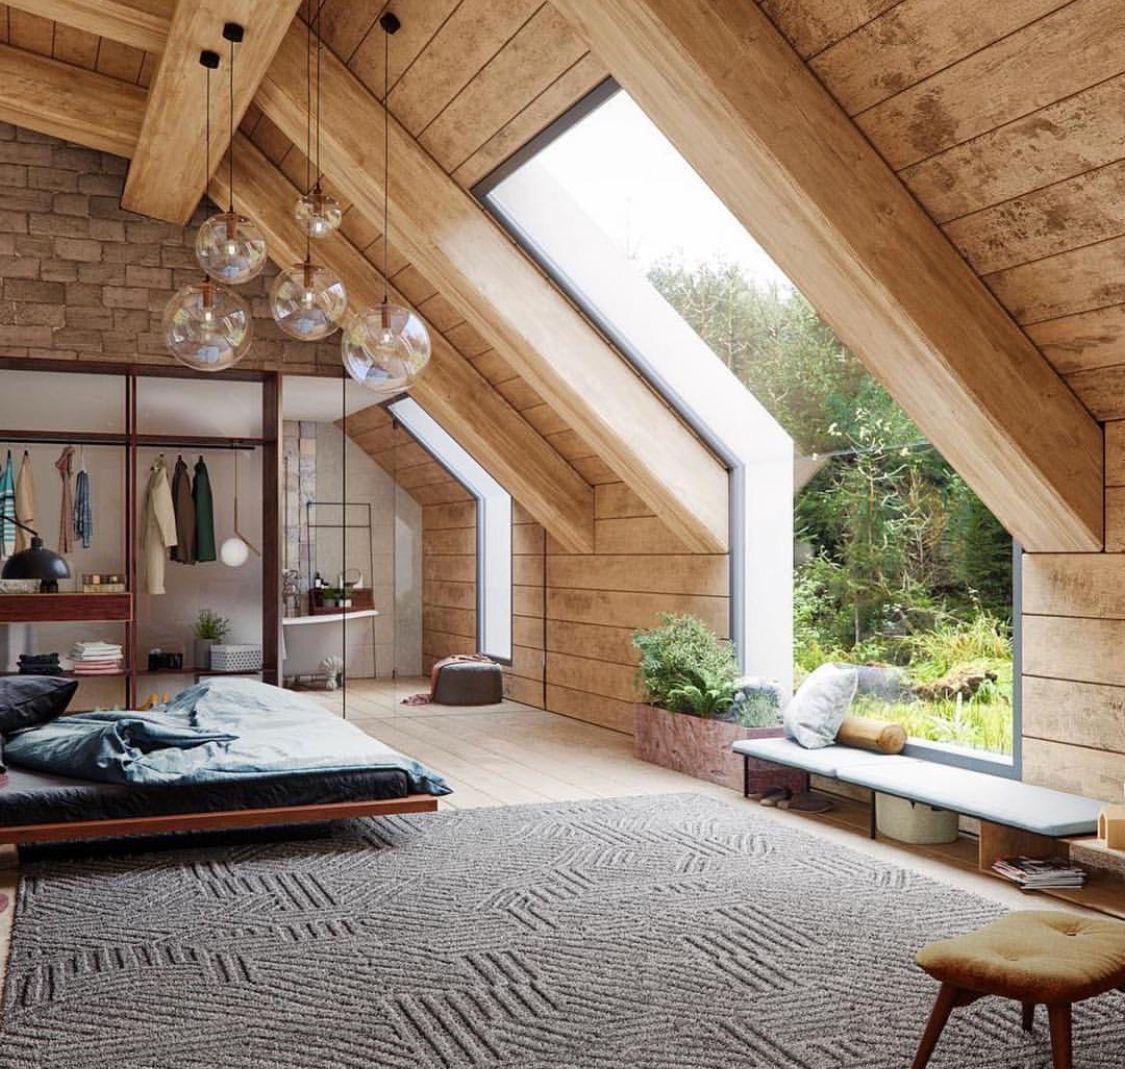 Home interior design windows extension idea lakeside house  extension ideas in   pinterest